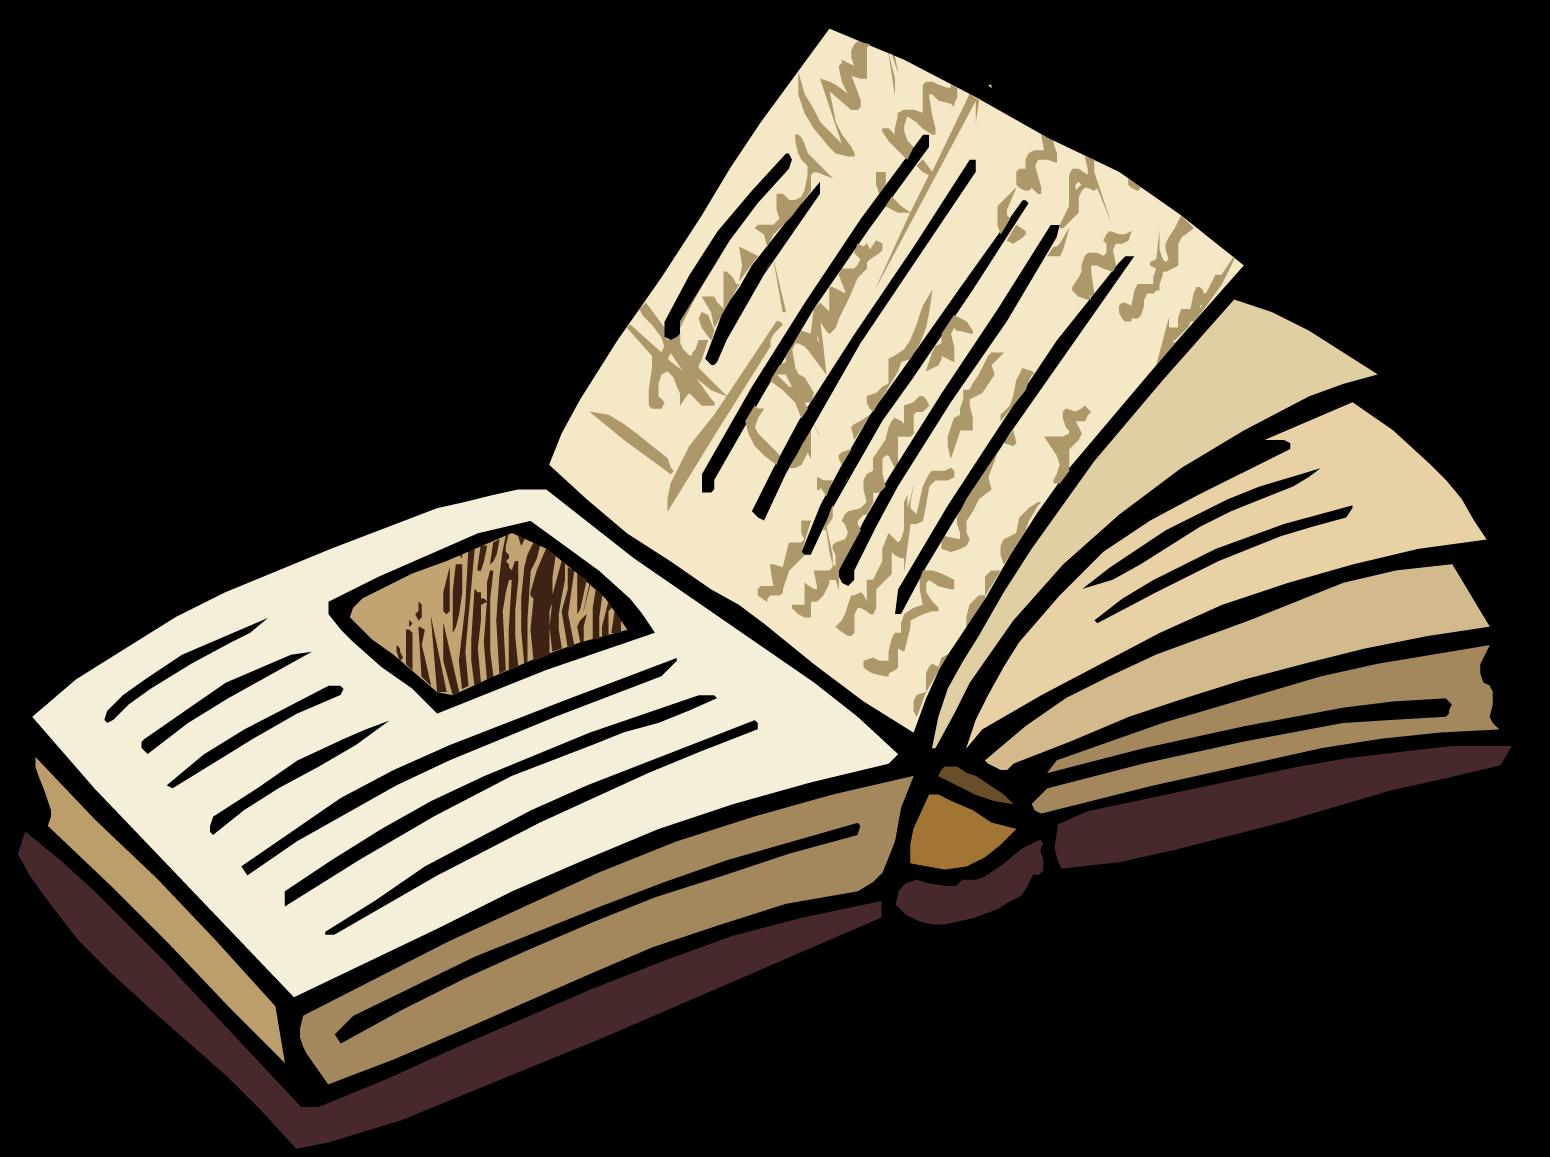 open book cartoon clipart - photo #28